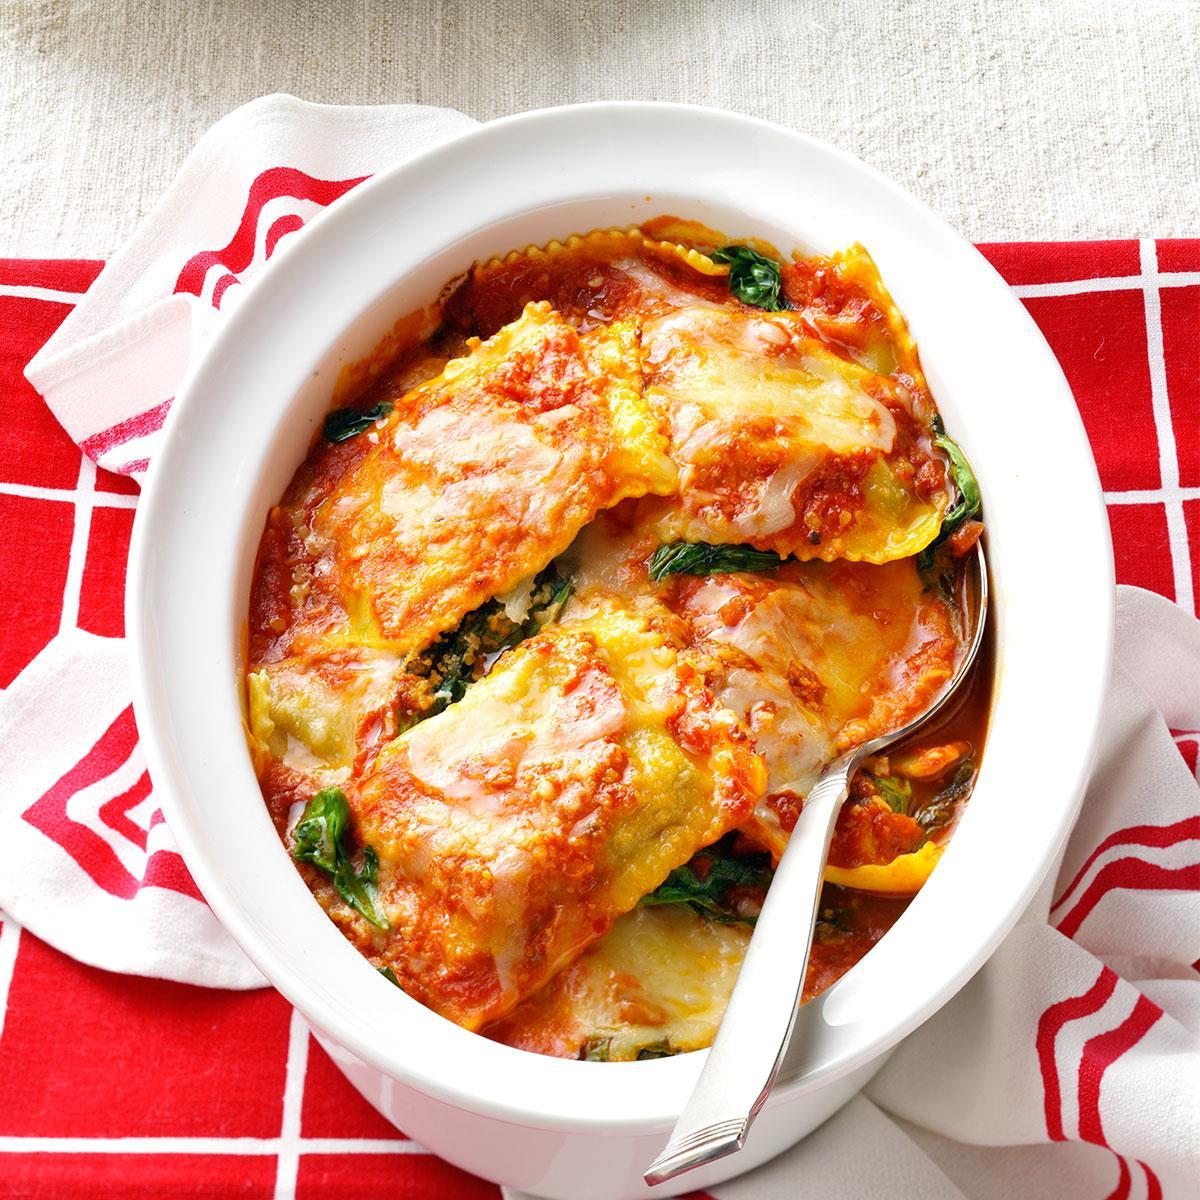 Spinach Ravioli Bake image